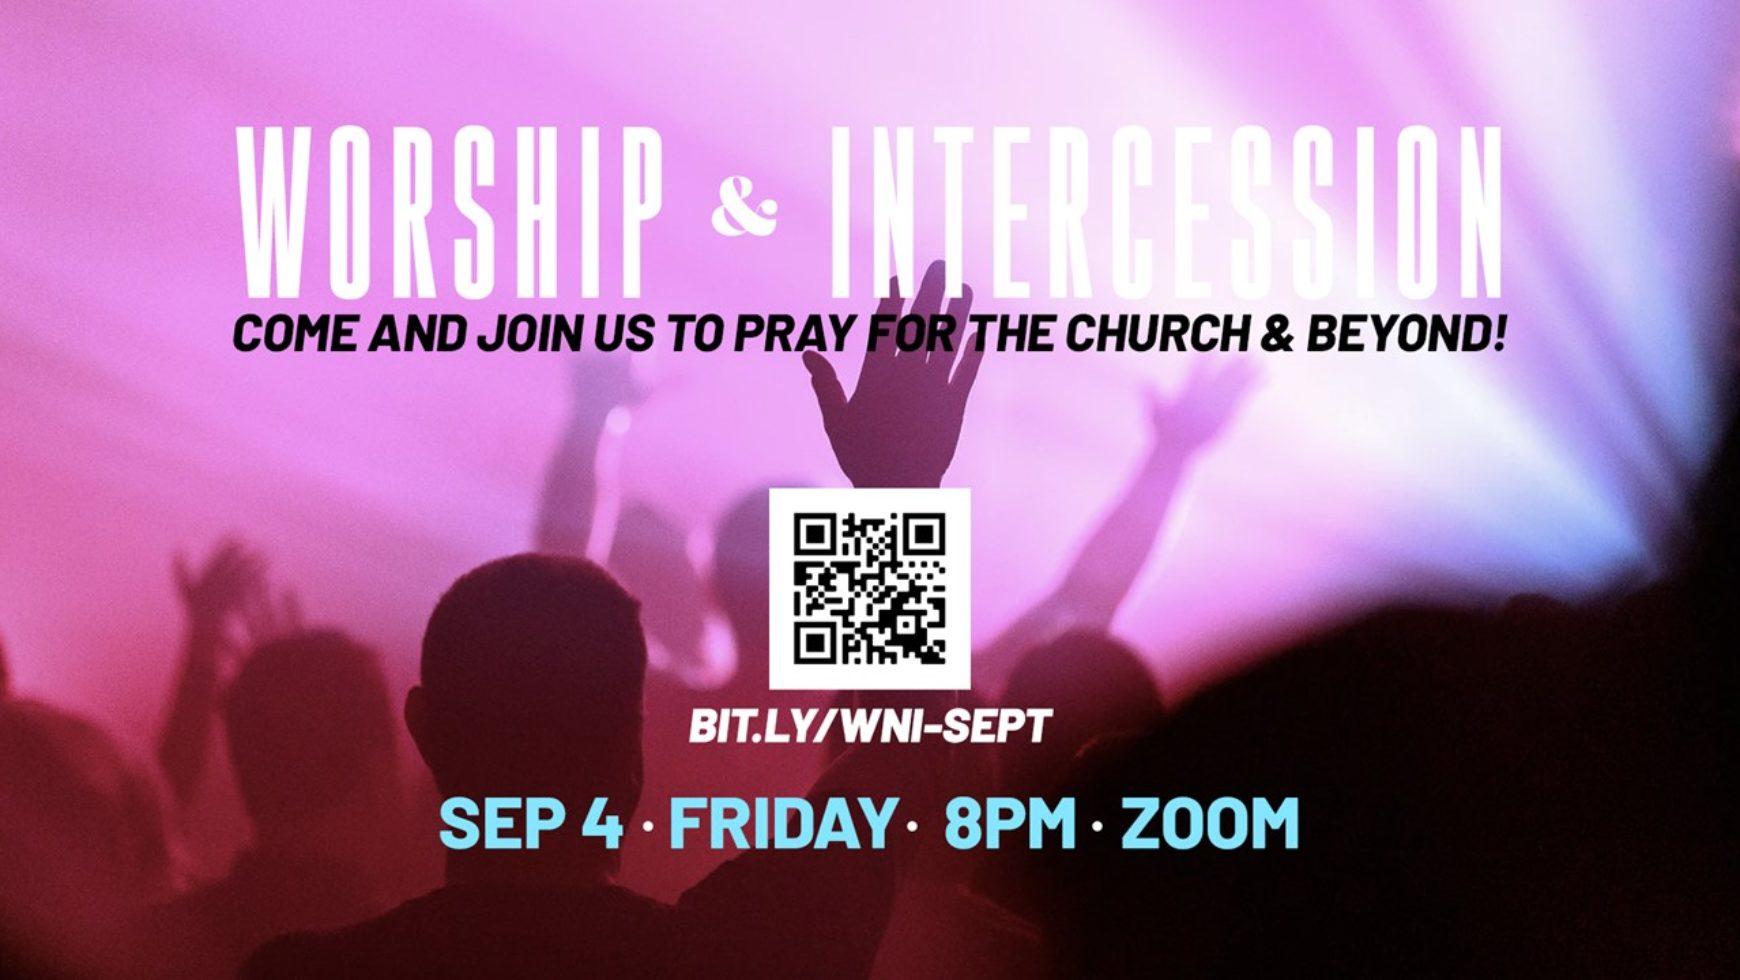 CORPORATE WORSHIP & INTERCESSION